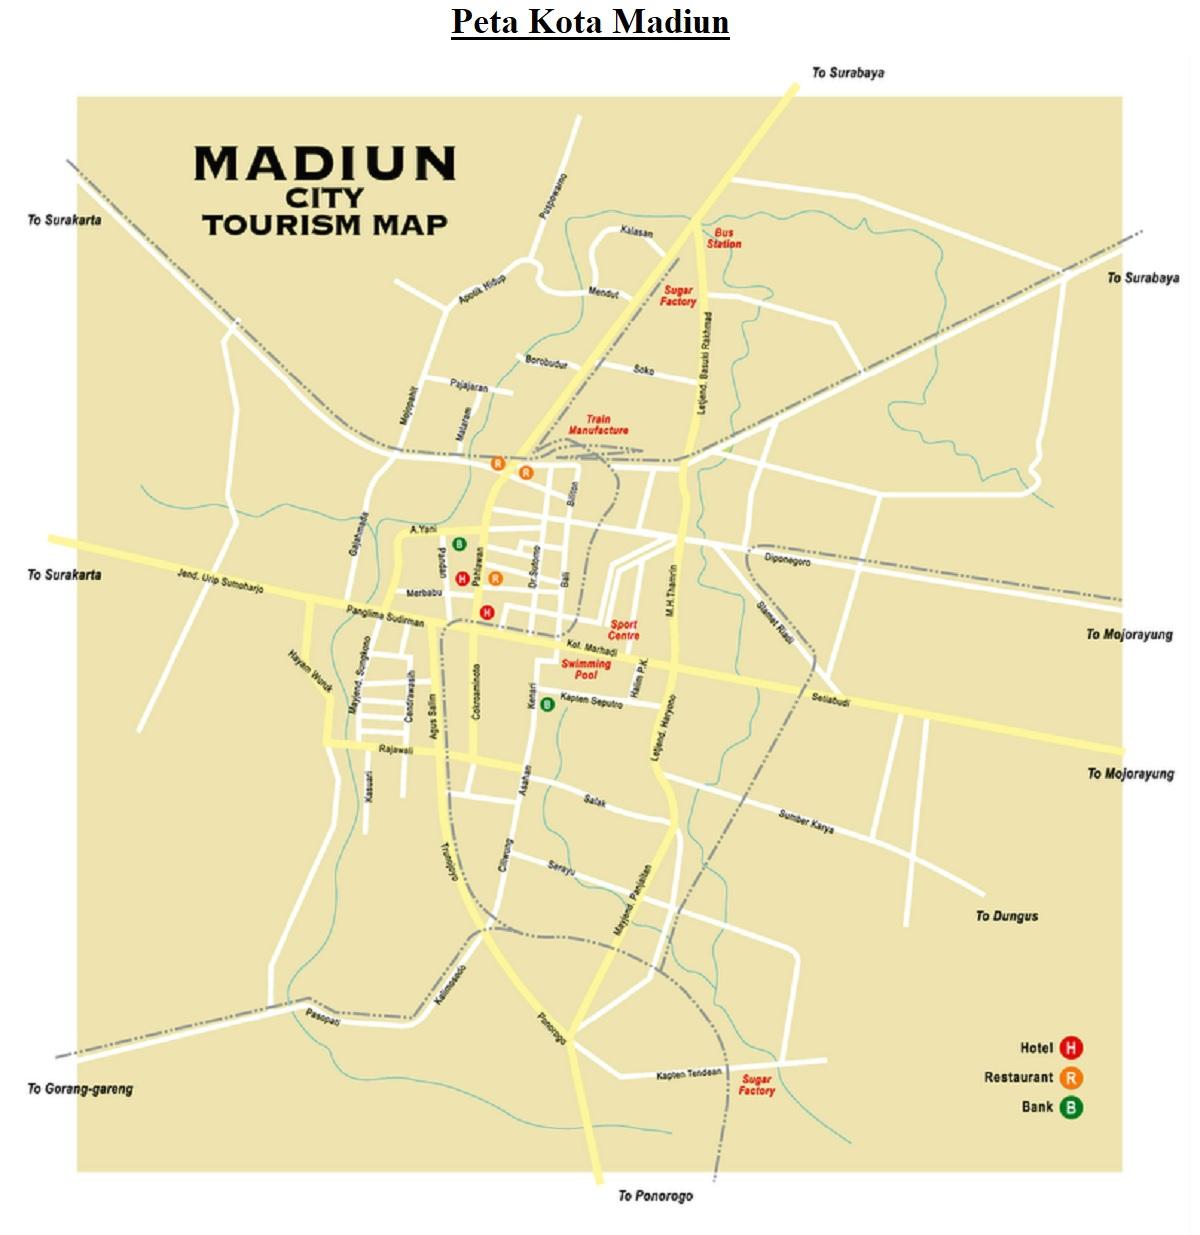 Peta Kota Madiun